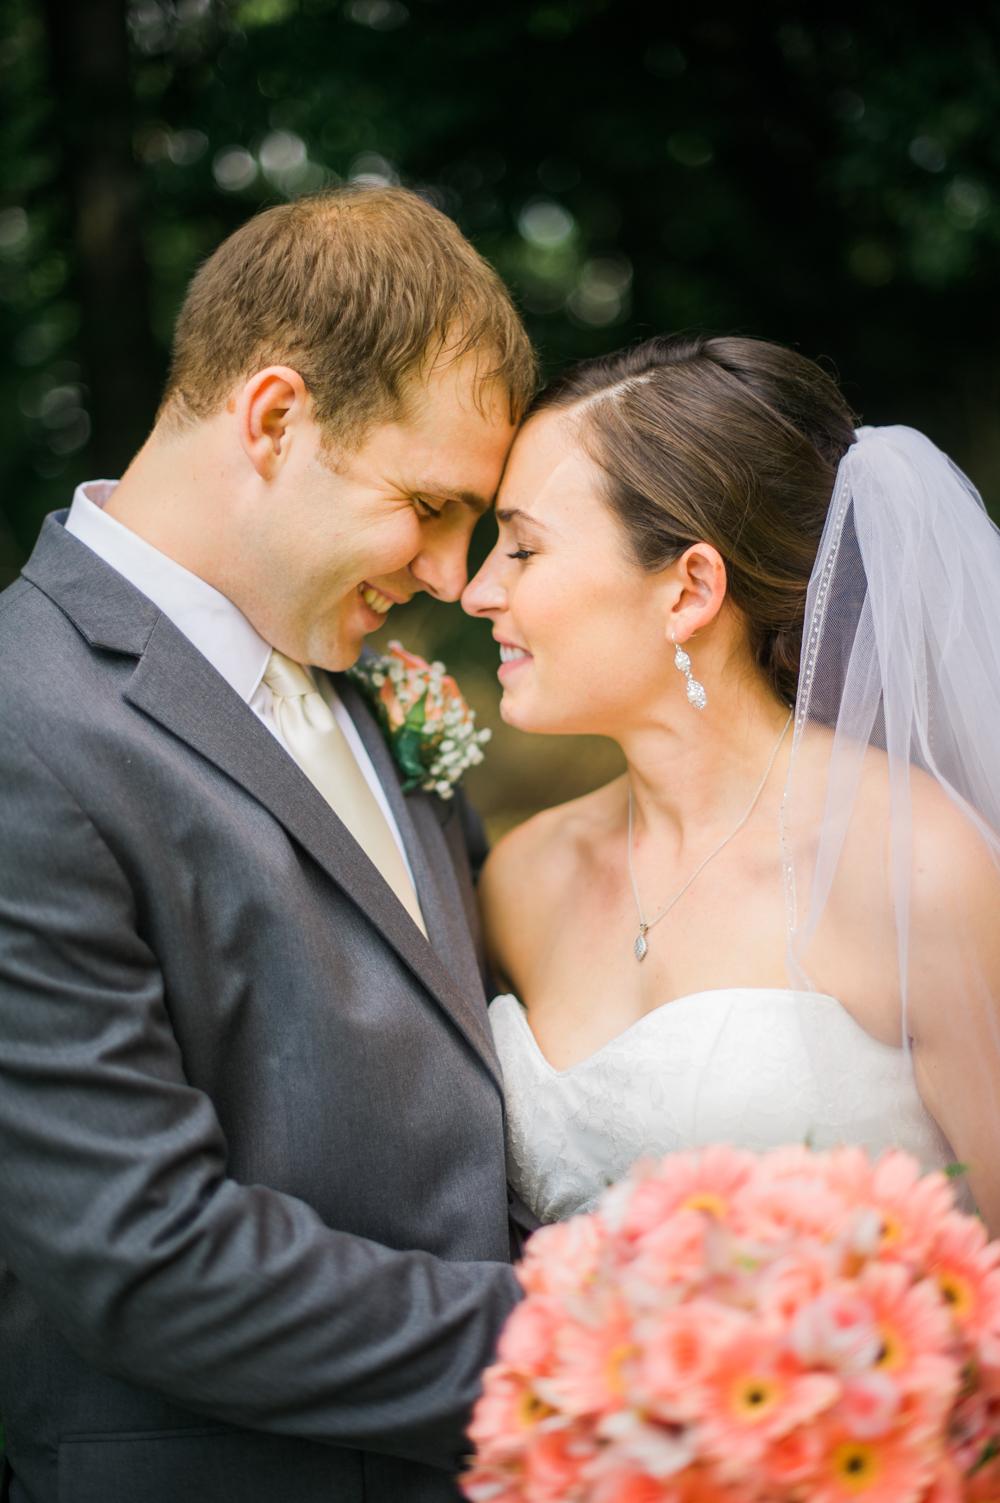 Mendenhall_Inn_Wedding_Pennsylvania_Rebecca_Watkins_Photography_2014-048.jpg